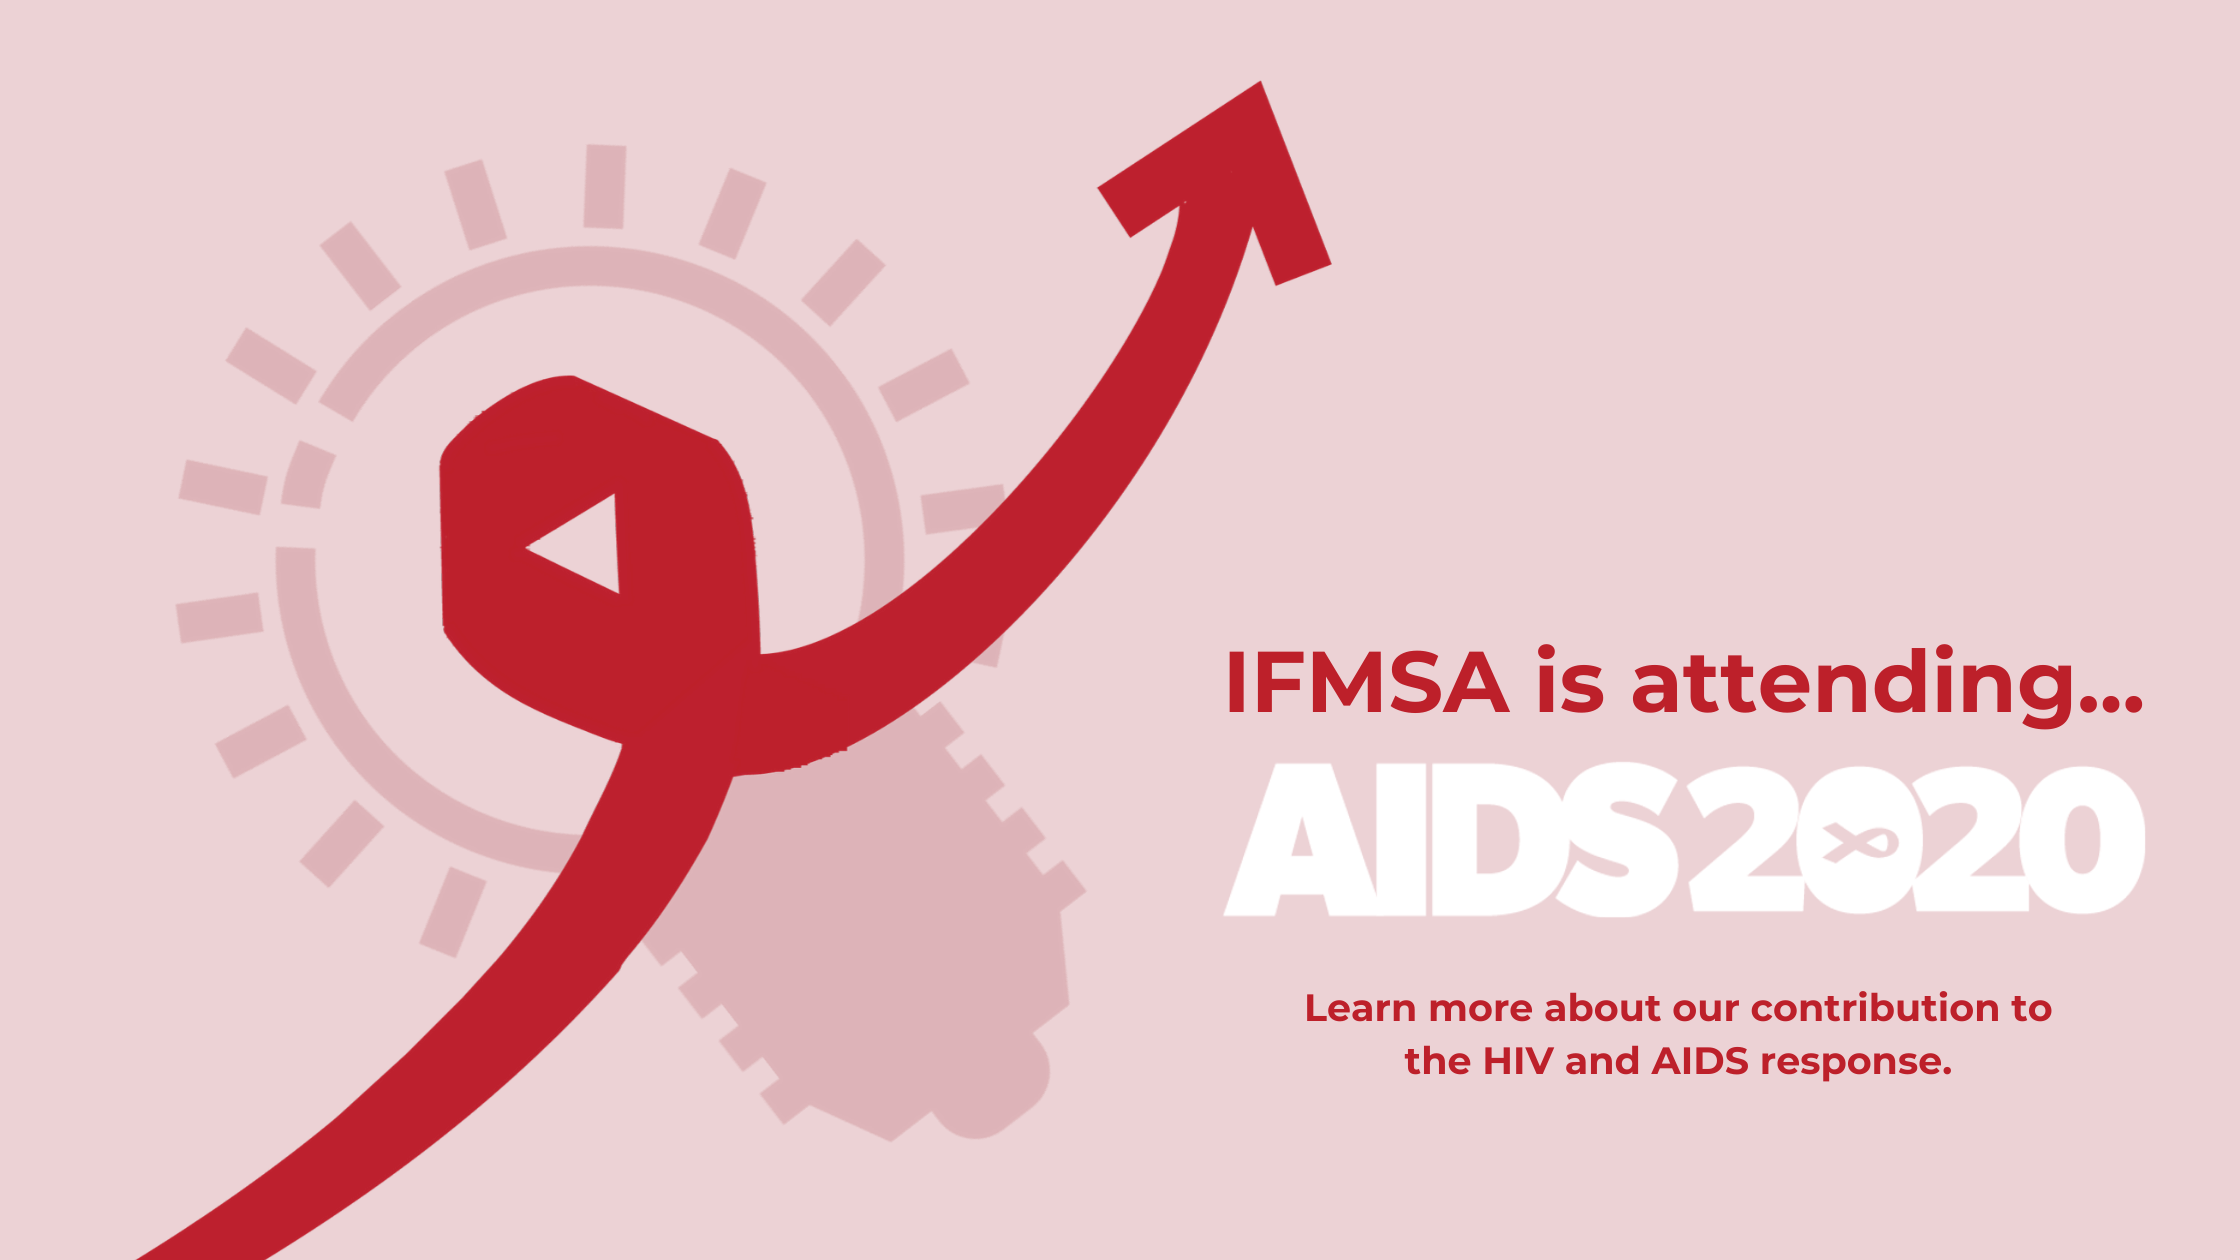 IFMSA @ AIDS2020